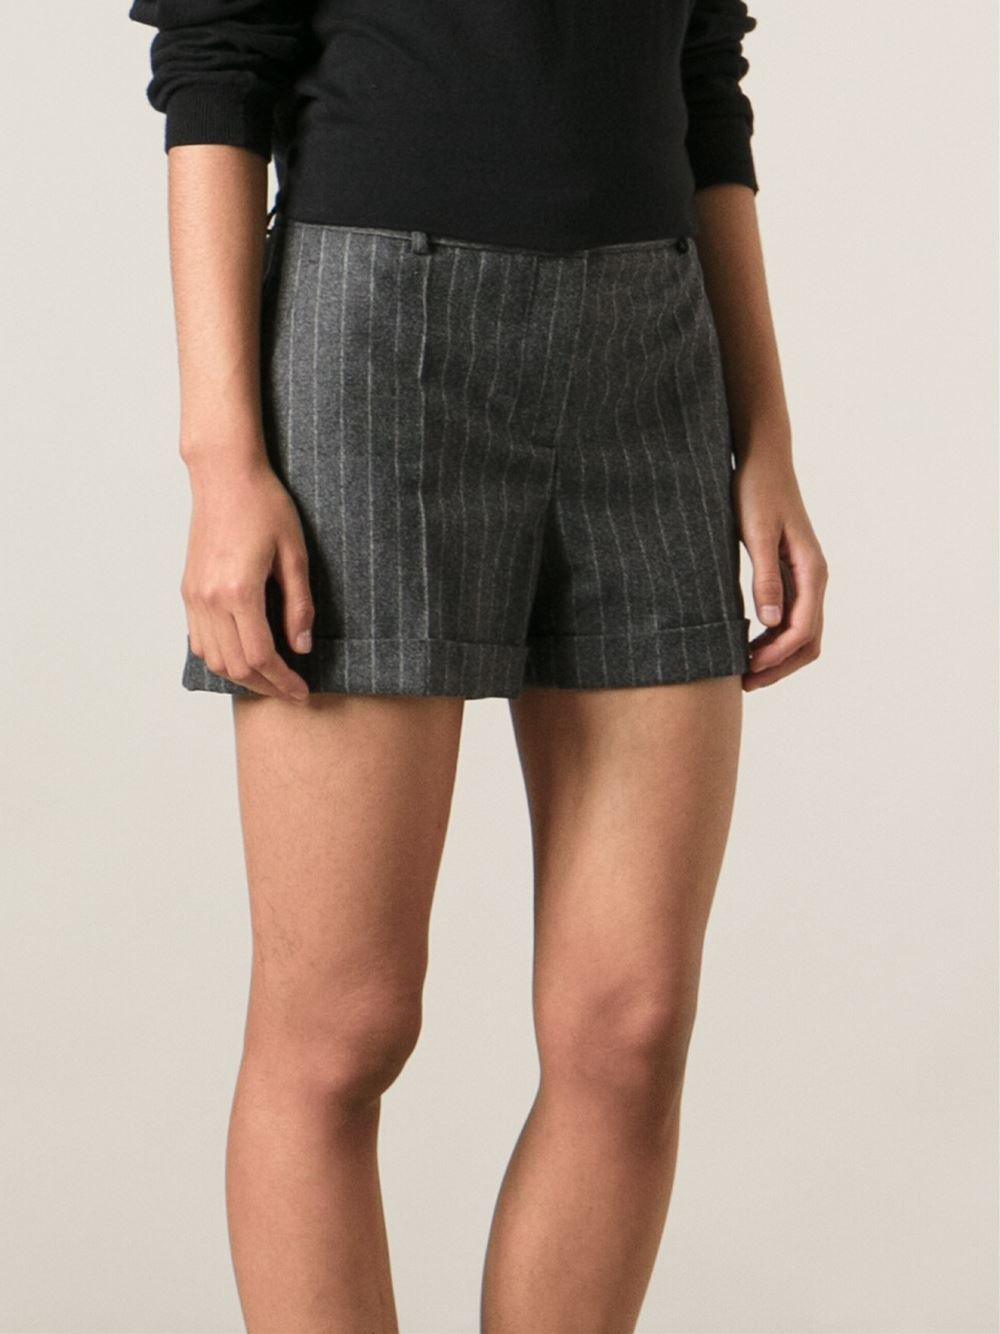 Alexander Mcqueen Pinstripe Shorts In Grey Gray - Lyst-4173